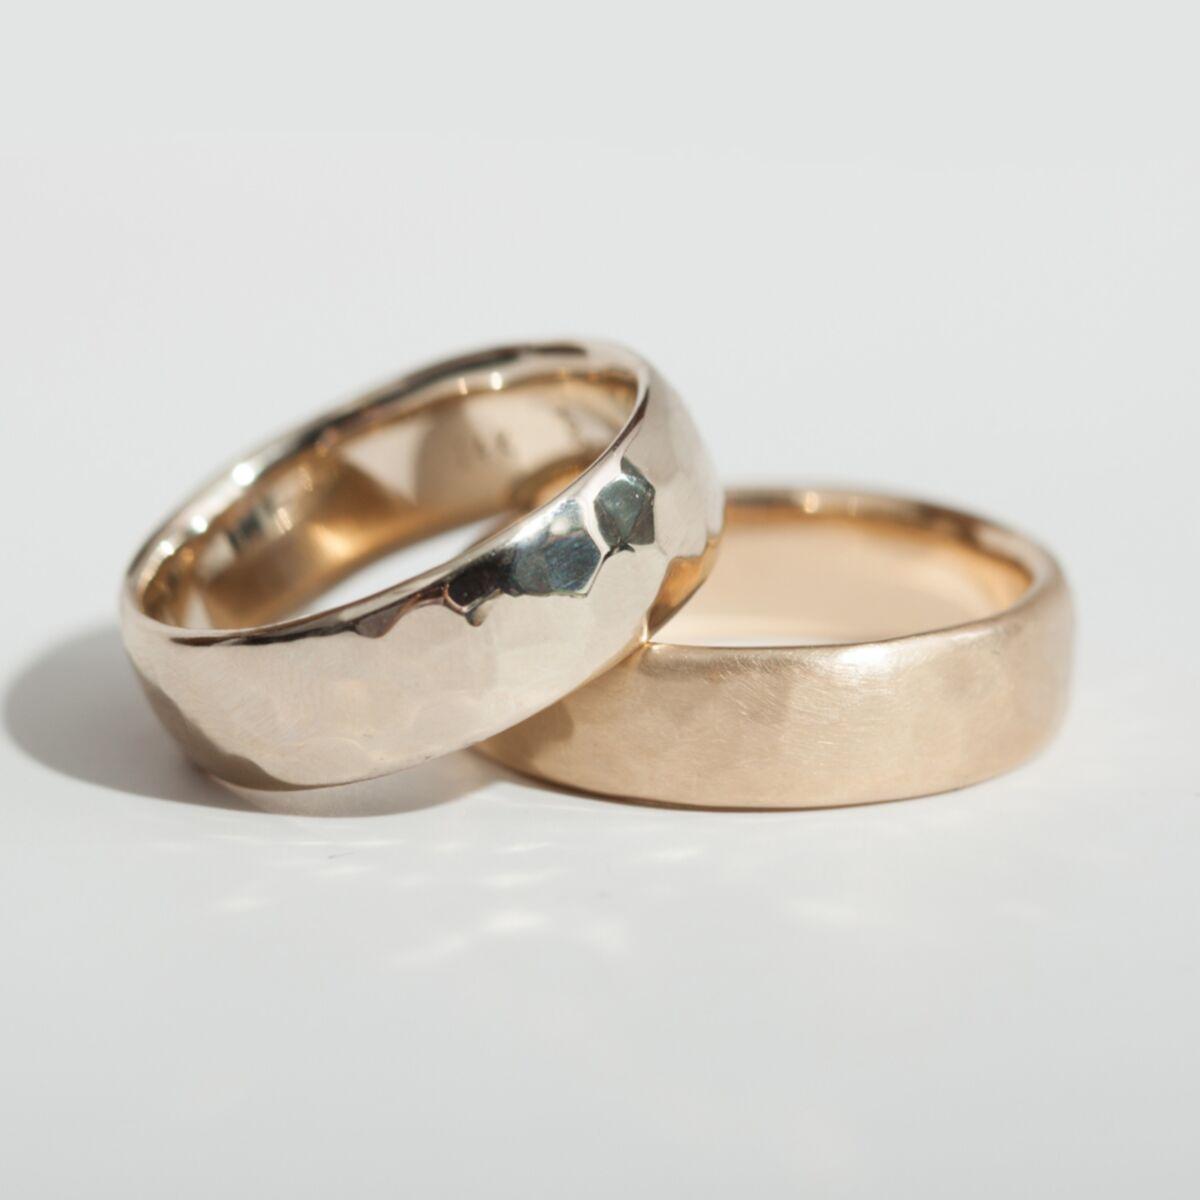 Cowboy Ring, 3mm image